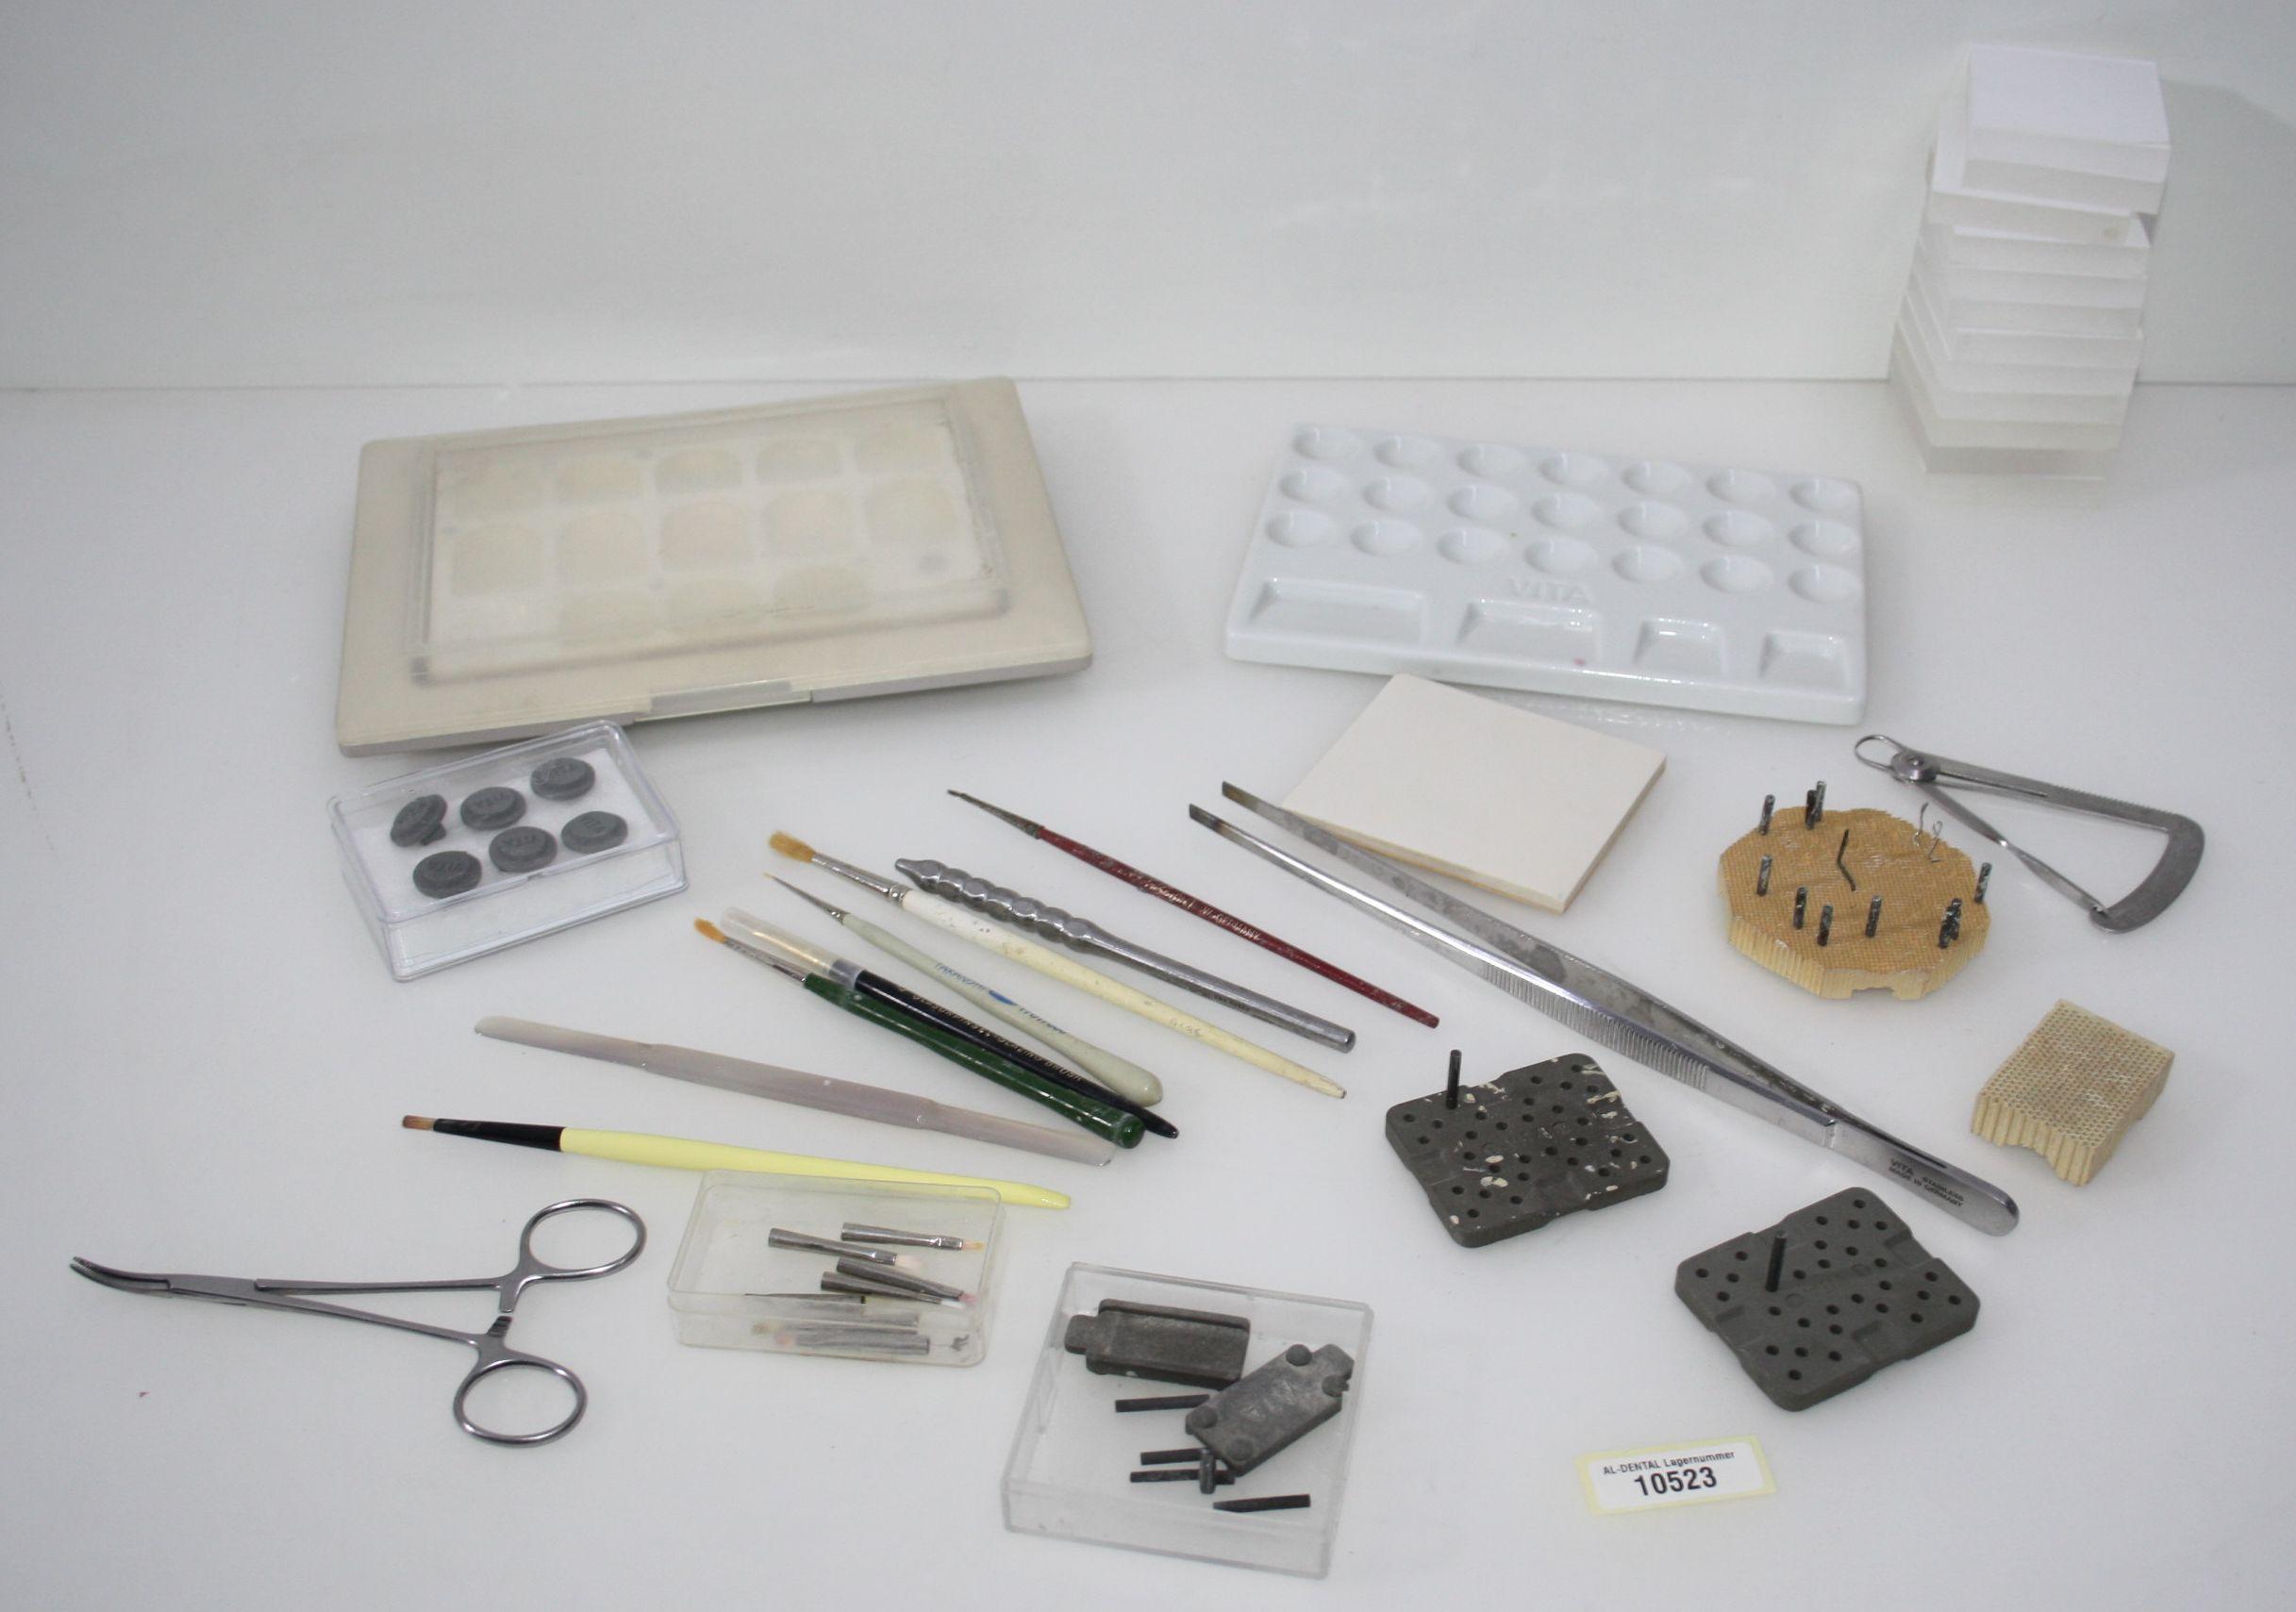 Dentallabor-Restposten diverses Keramik-Equipment # 10523